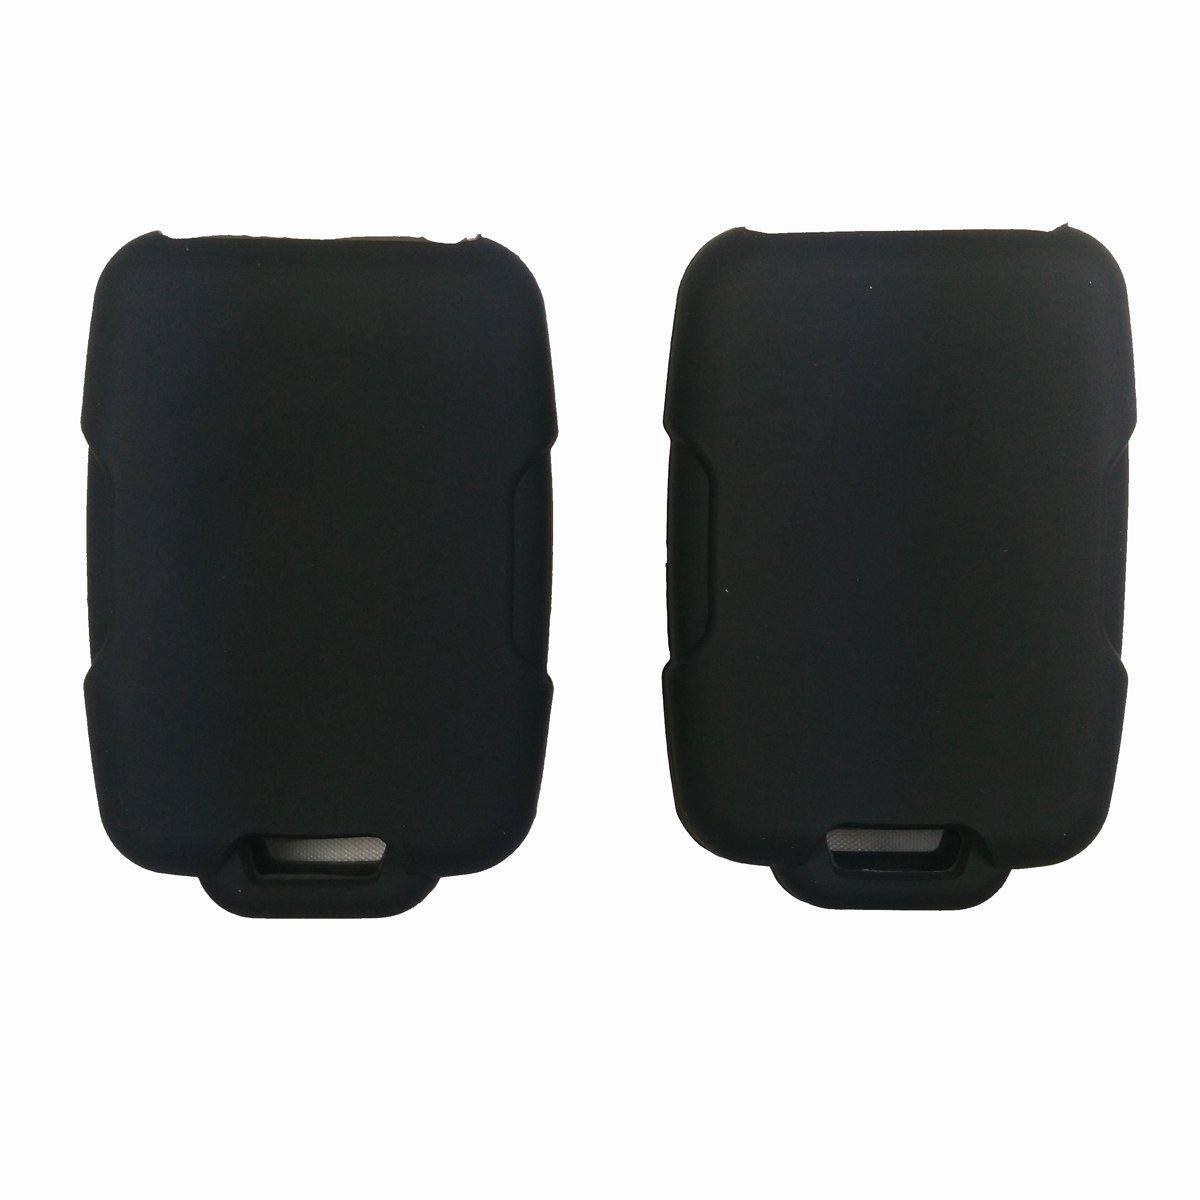 Coolbestda 2Pcs Rubber Key Fob Keyless Entry Protector Case Jacket Holder for 2018 Chevrolet Chevy Silverado Colorado GMC Canyon Sierra Yukon Cadillac M3N32337100